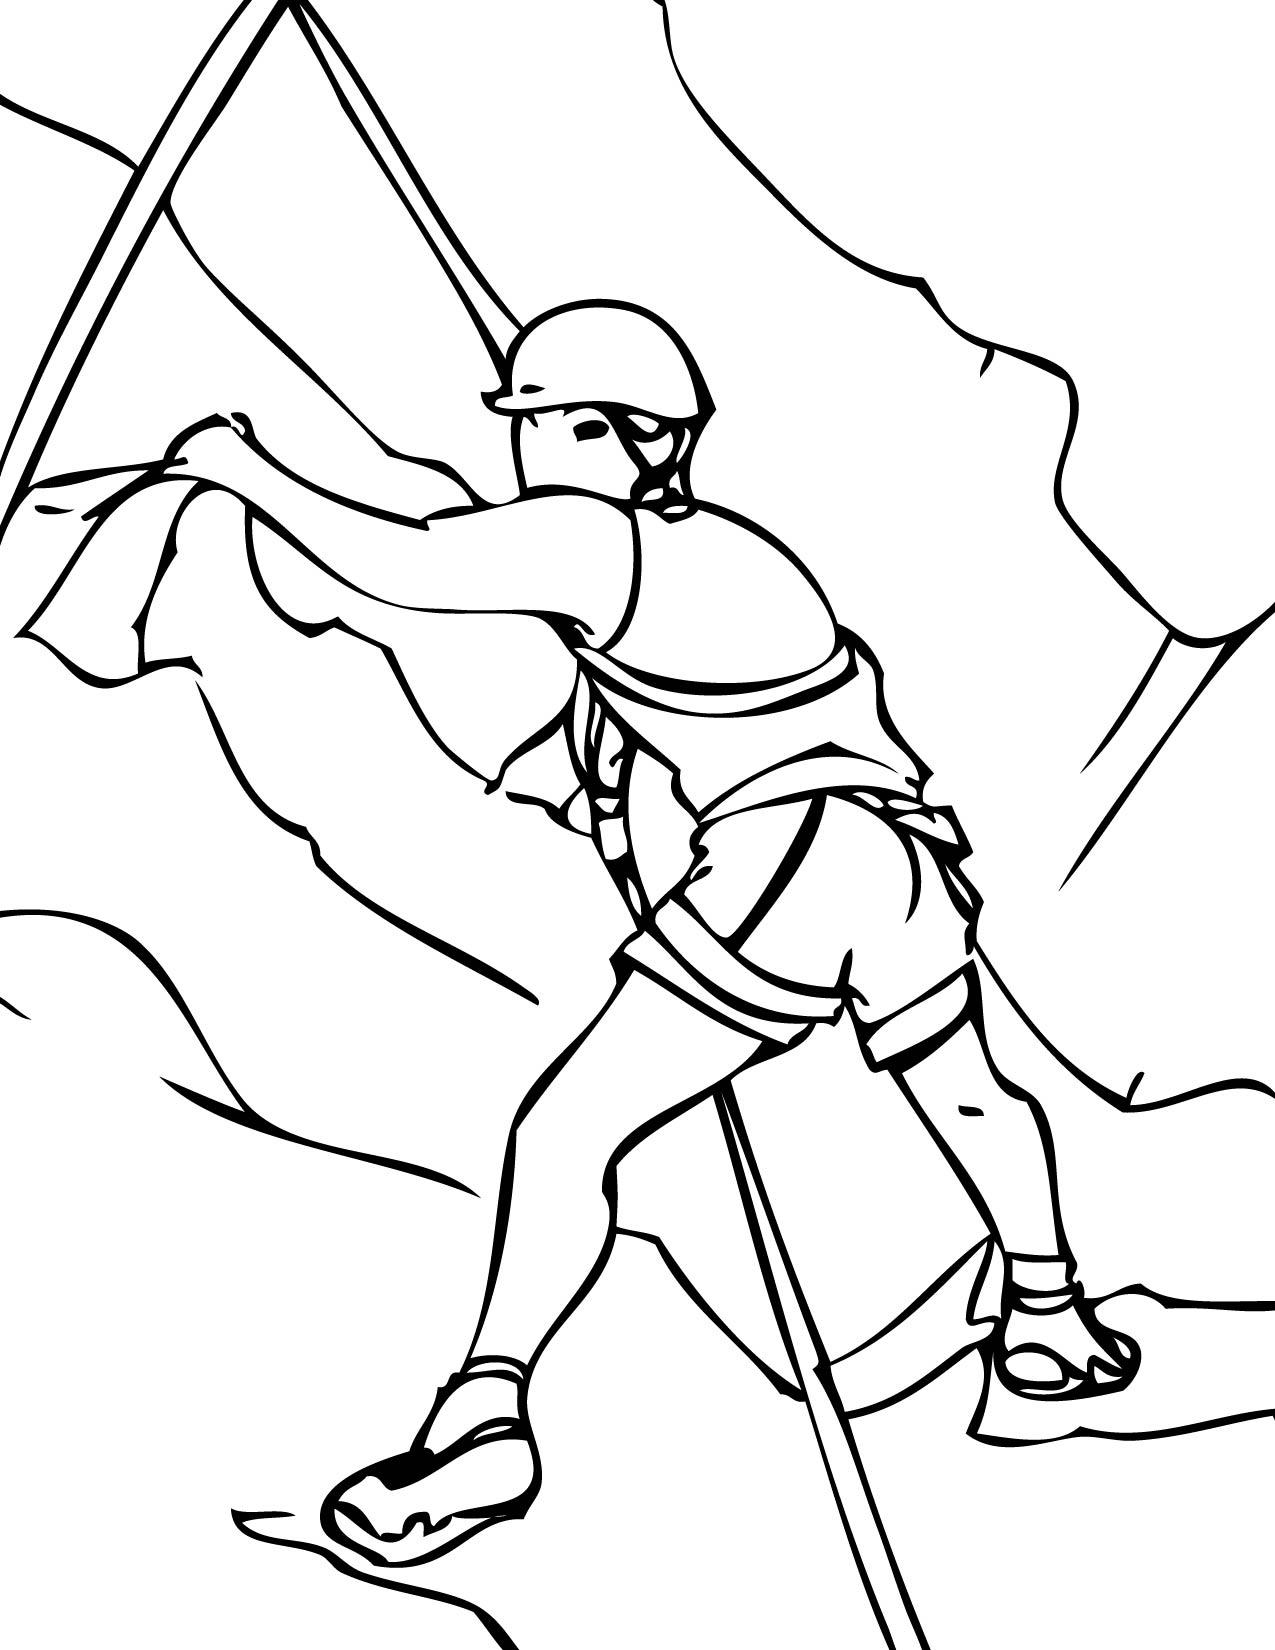 kleurplaat berg beklimmen kidkleurplaat nl